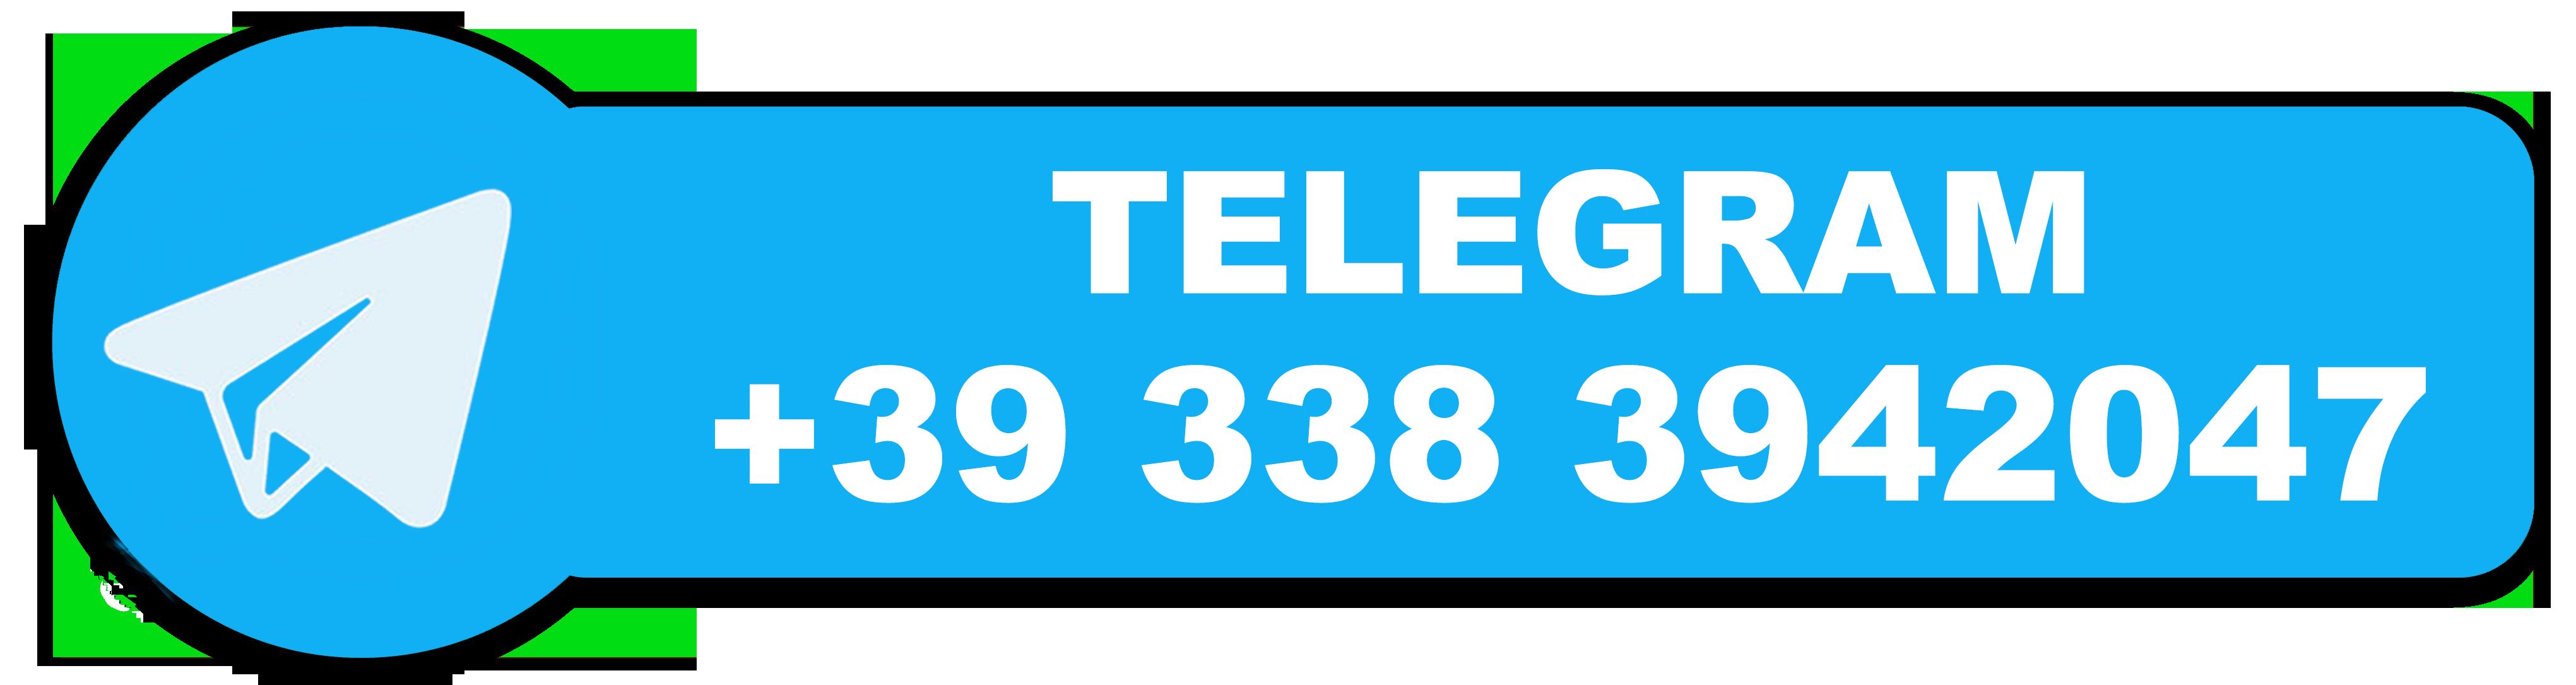 chiama un taxi a verona con telegram